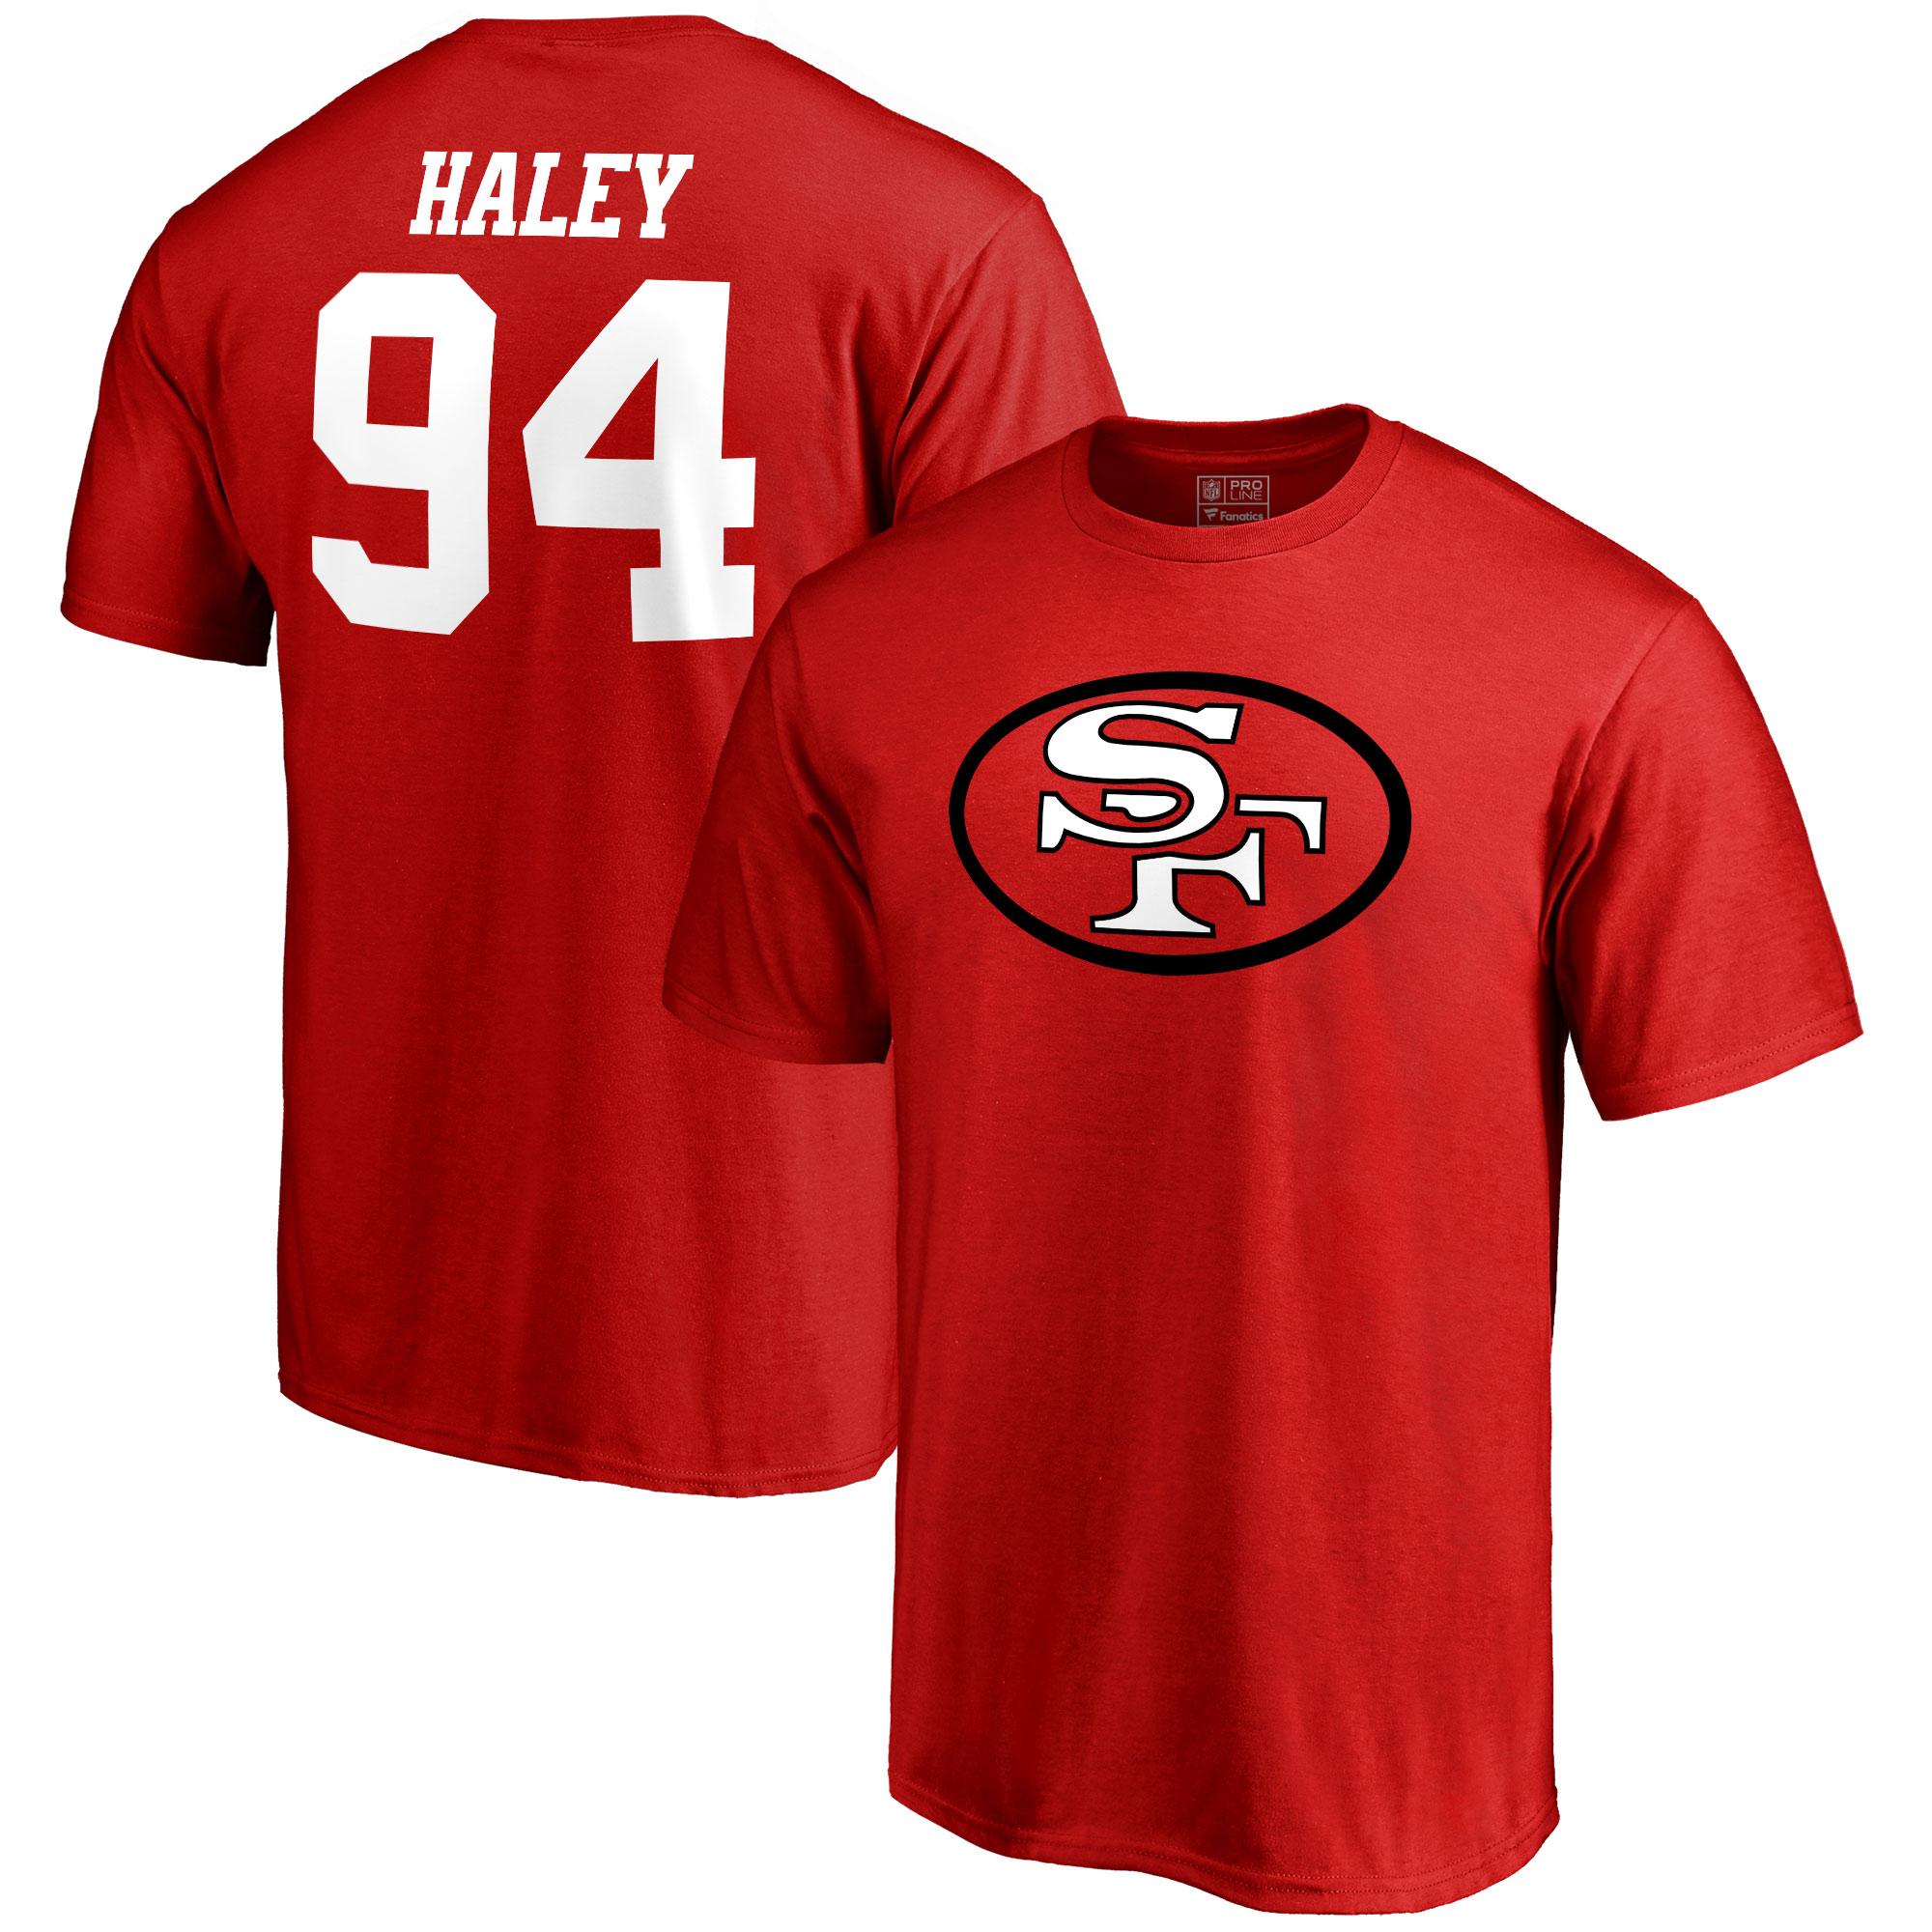 Charles Haley San Francisco 49ers NFL Pro Line Retired Player Name & Number T-Shirt - Scarlet